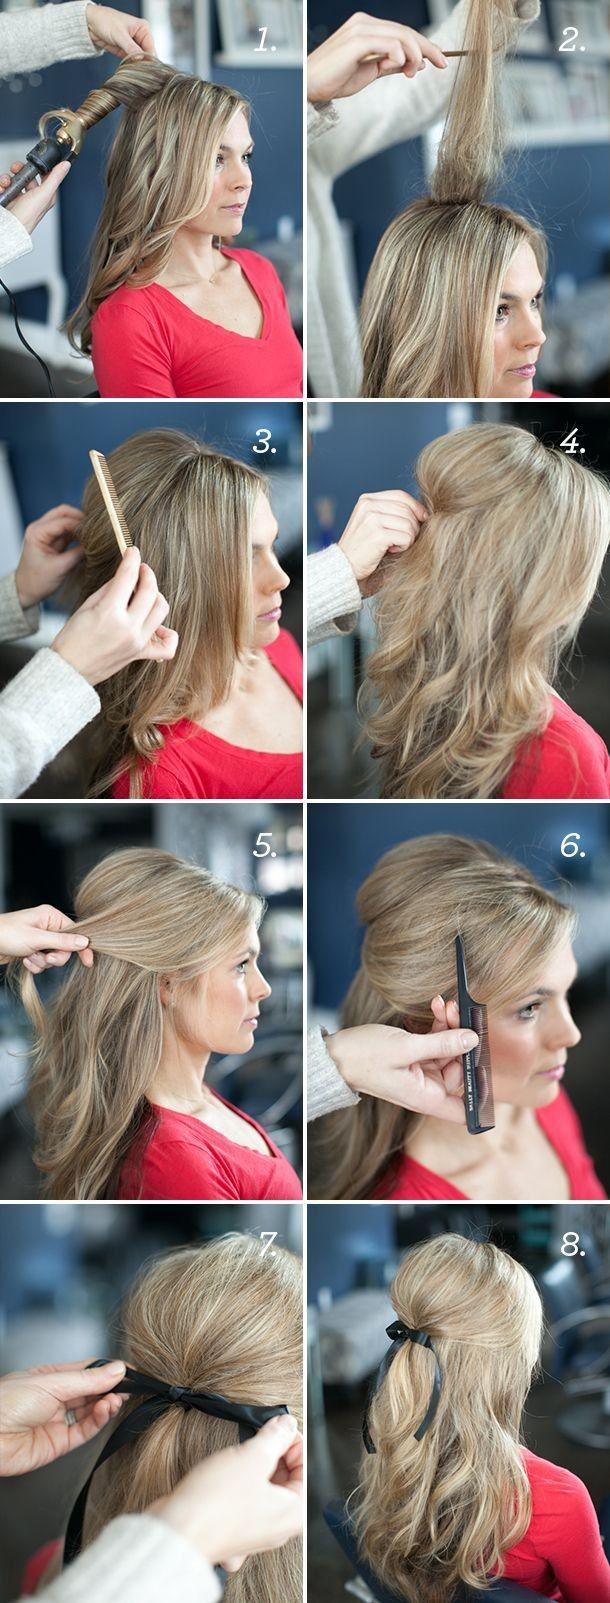 10 fun and fab diy hairstyles for long hair   hair/makeup